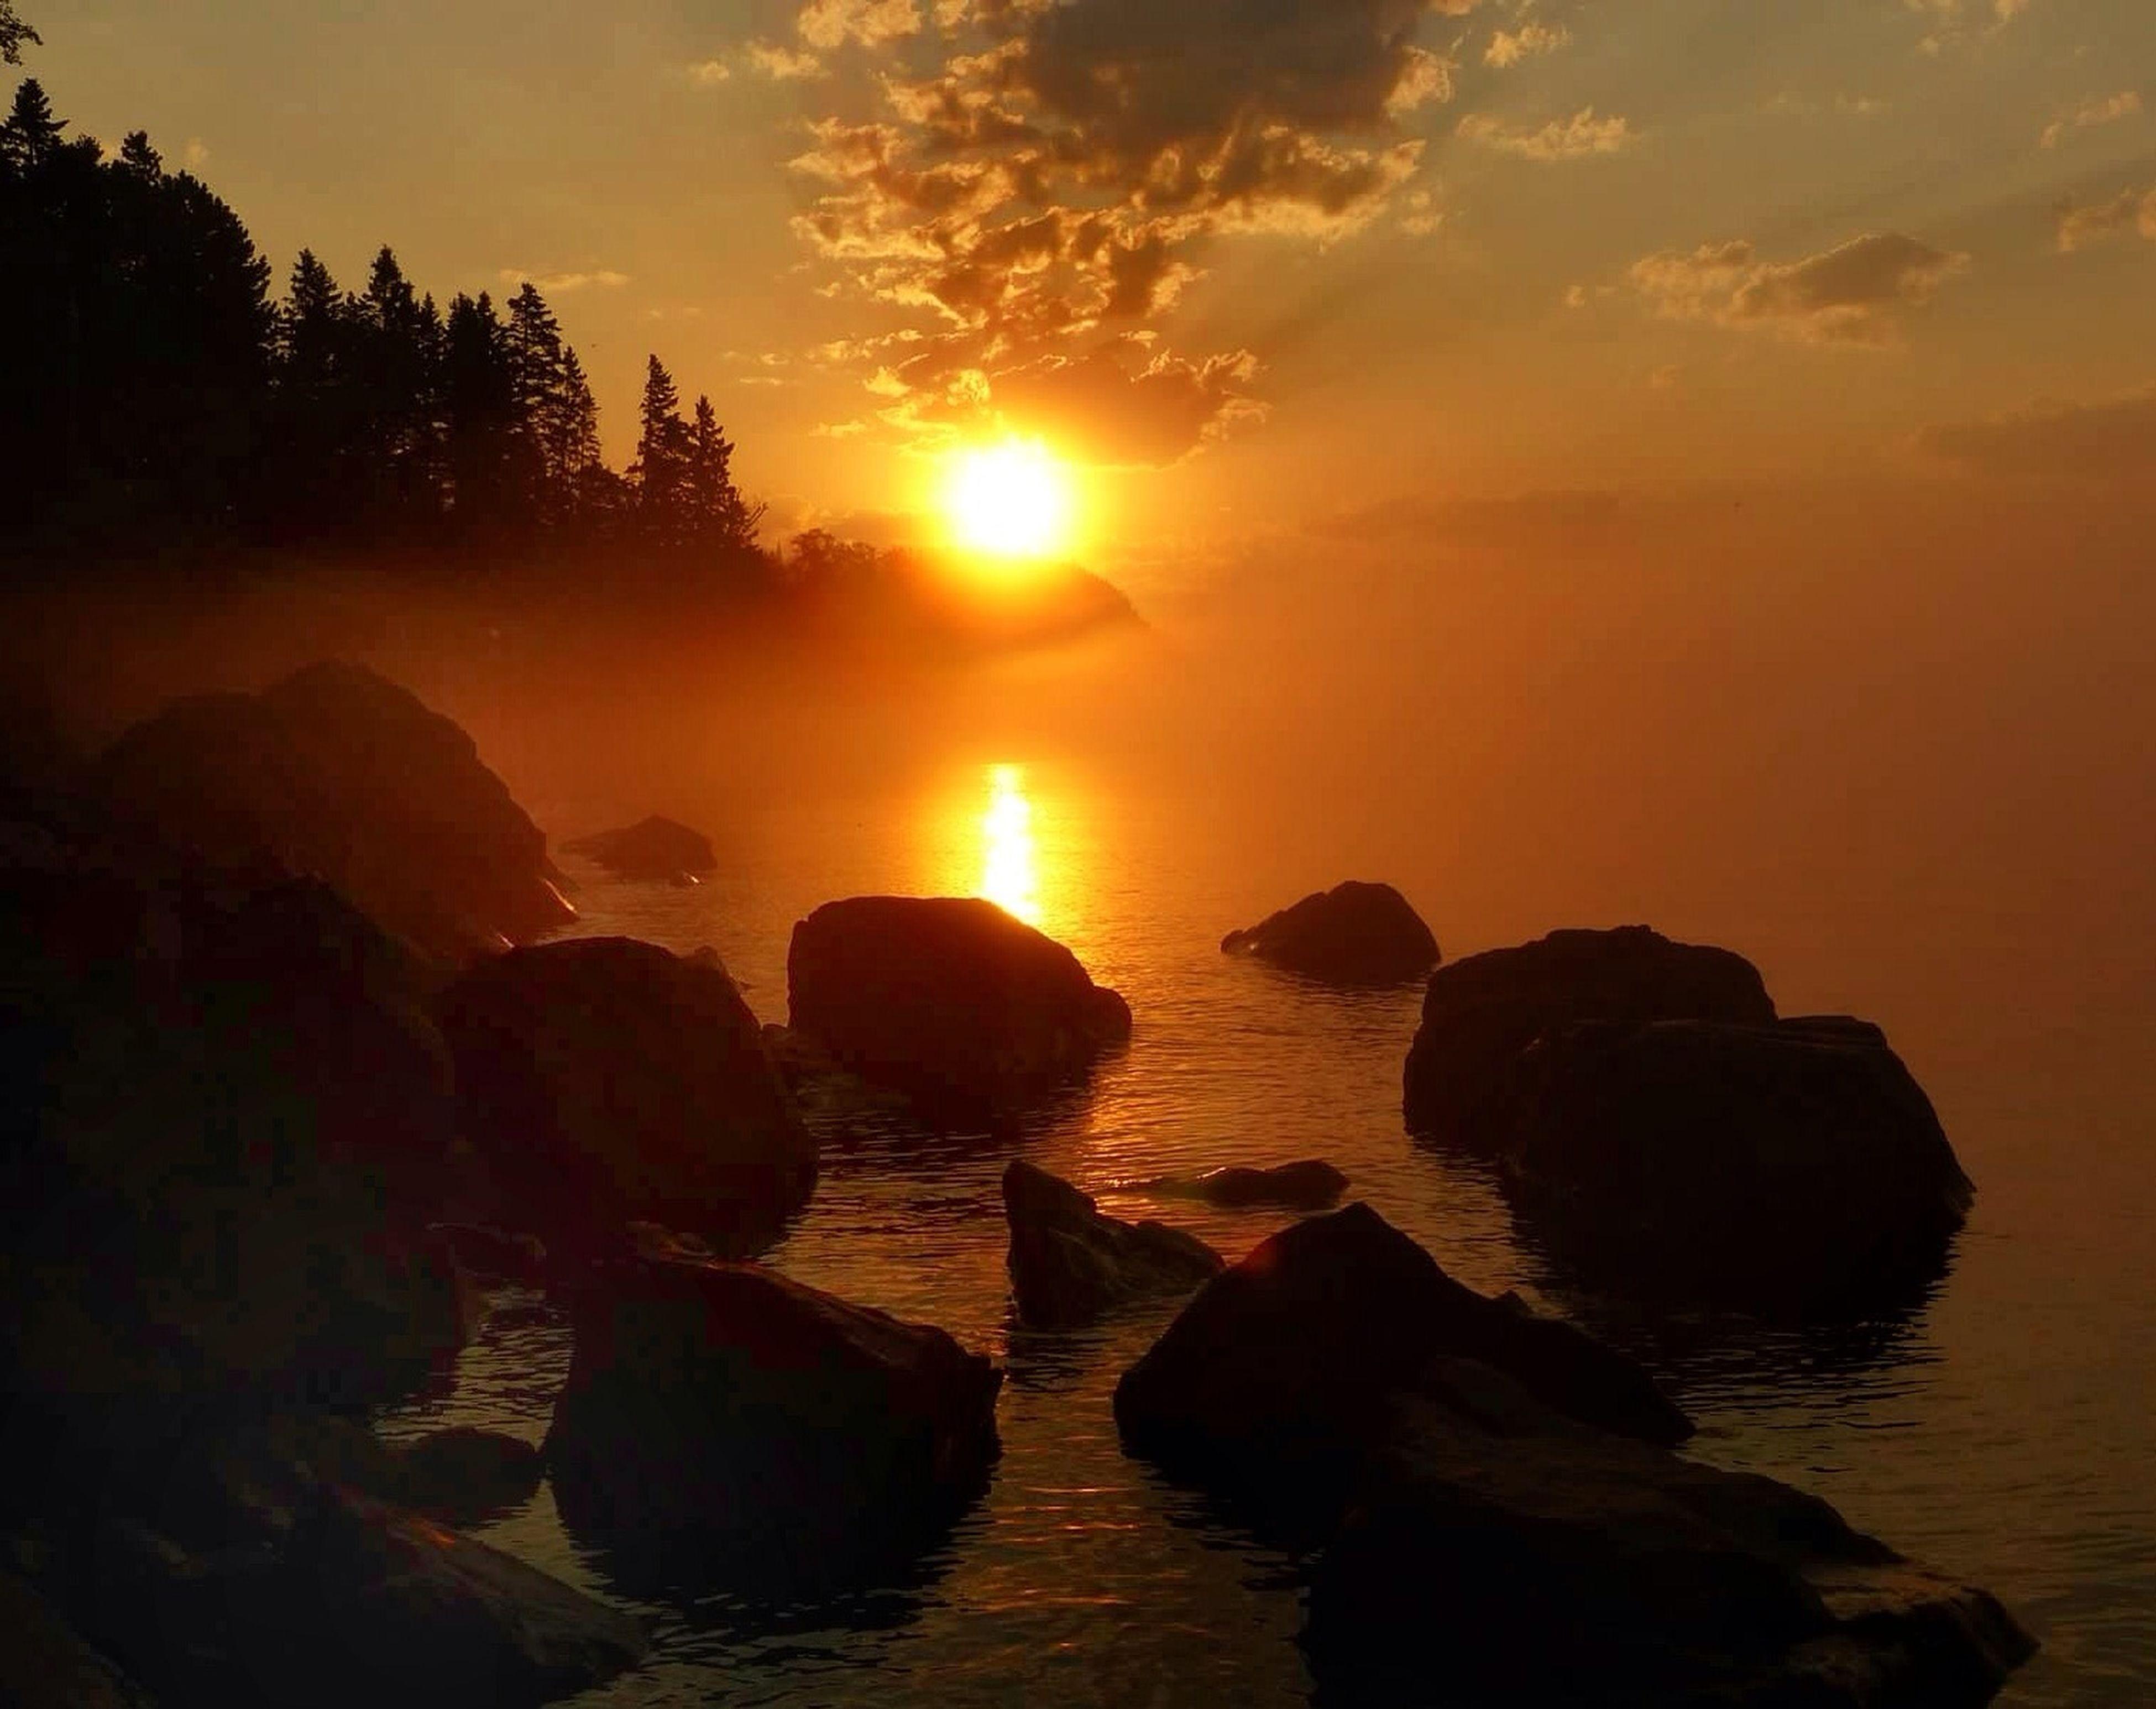 sunset, water, sky, sun, scenics, orange color, tranquil scene, tranquility, reflection, beauty in nature, silhouette, nature, idyllic, cloud - sky, sunlight, outdoors, cloud, sea, non-urban scene, lake